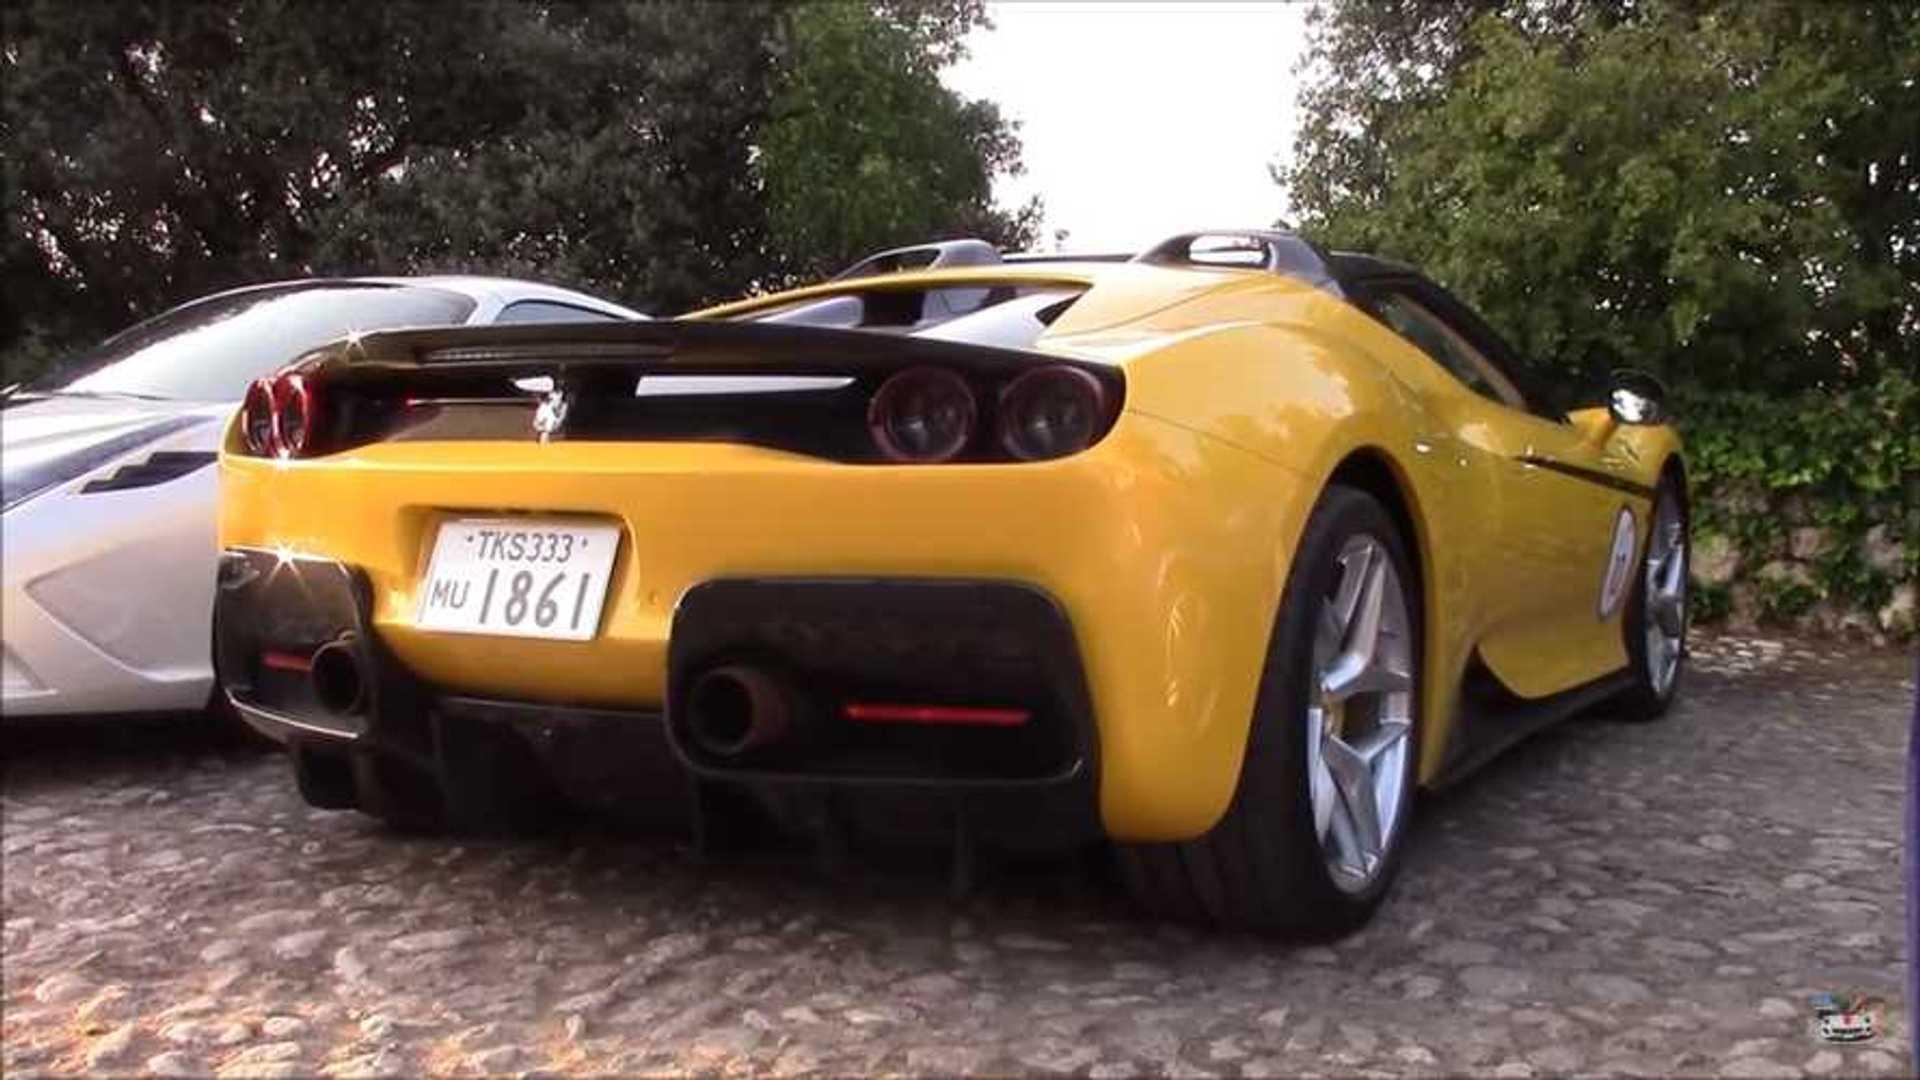 Ferrari J50 shows all its brilliance on video